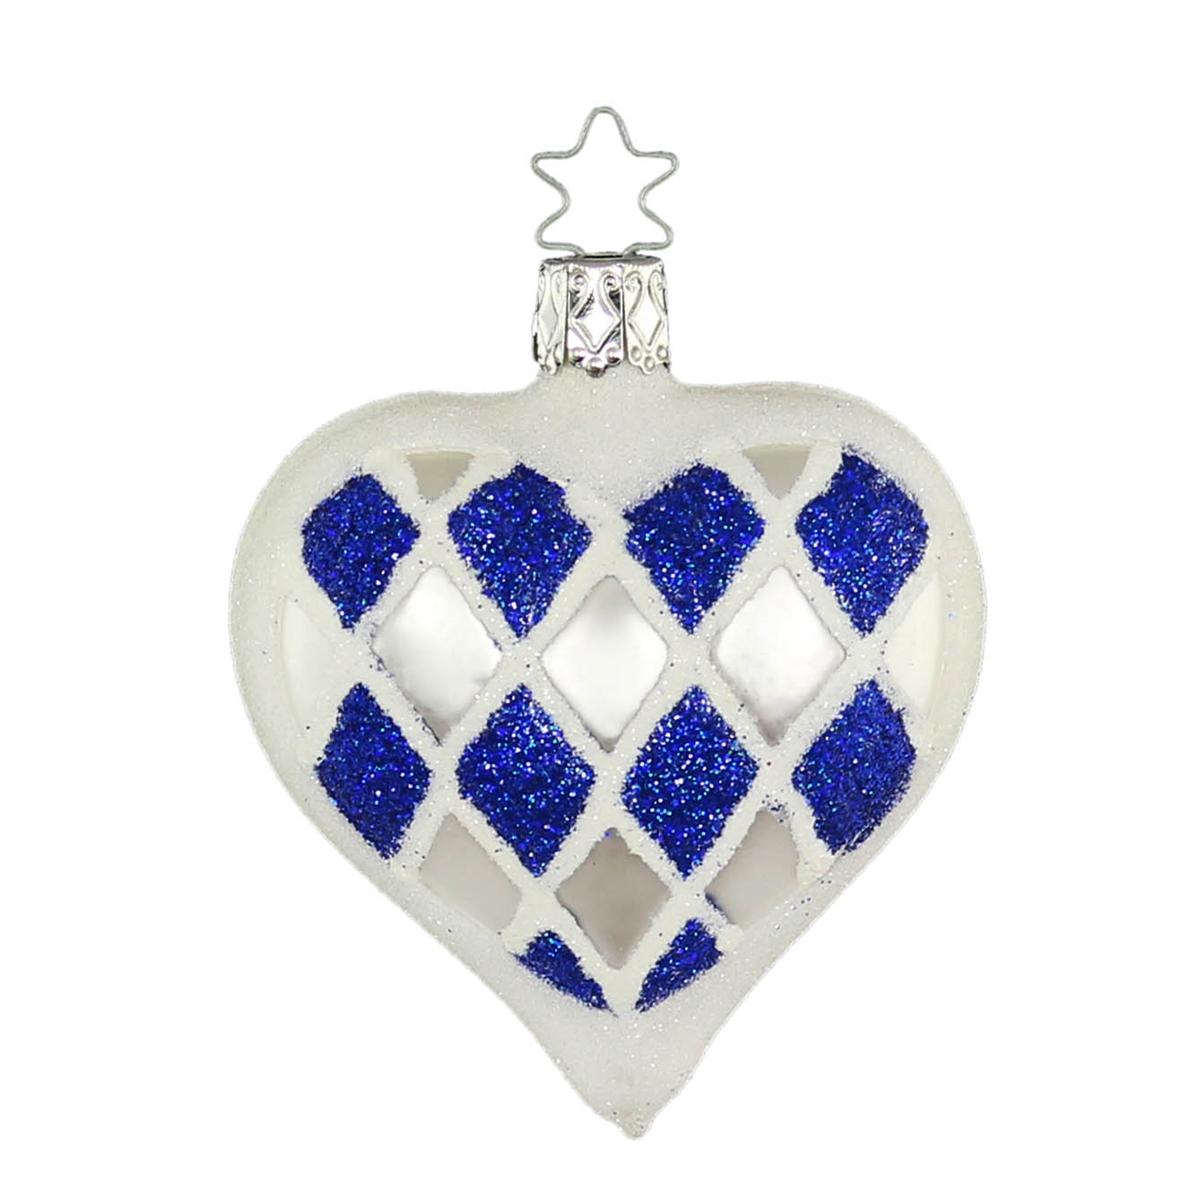 BLUE INGE GLAS BAVARIA HEART FLAG MUNICH GERMAN BLOWN GLASS CHRISTMAS ORNAMENT